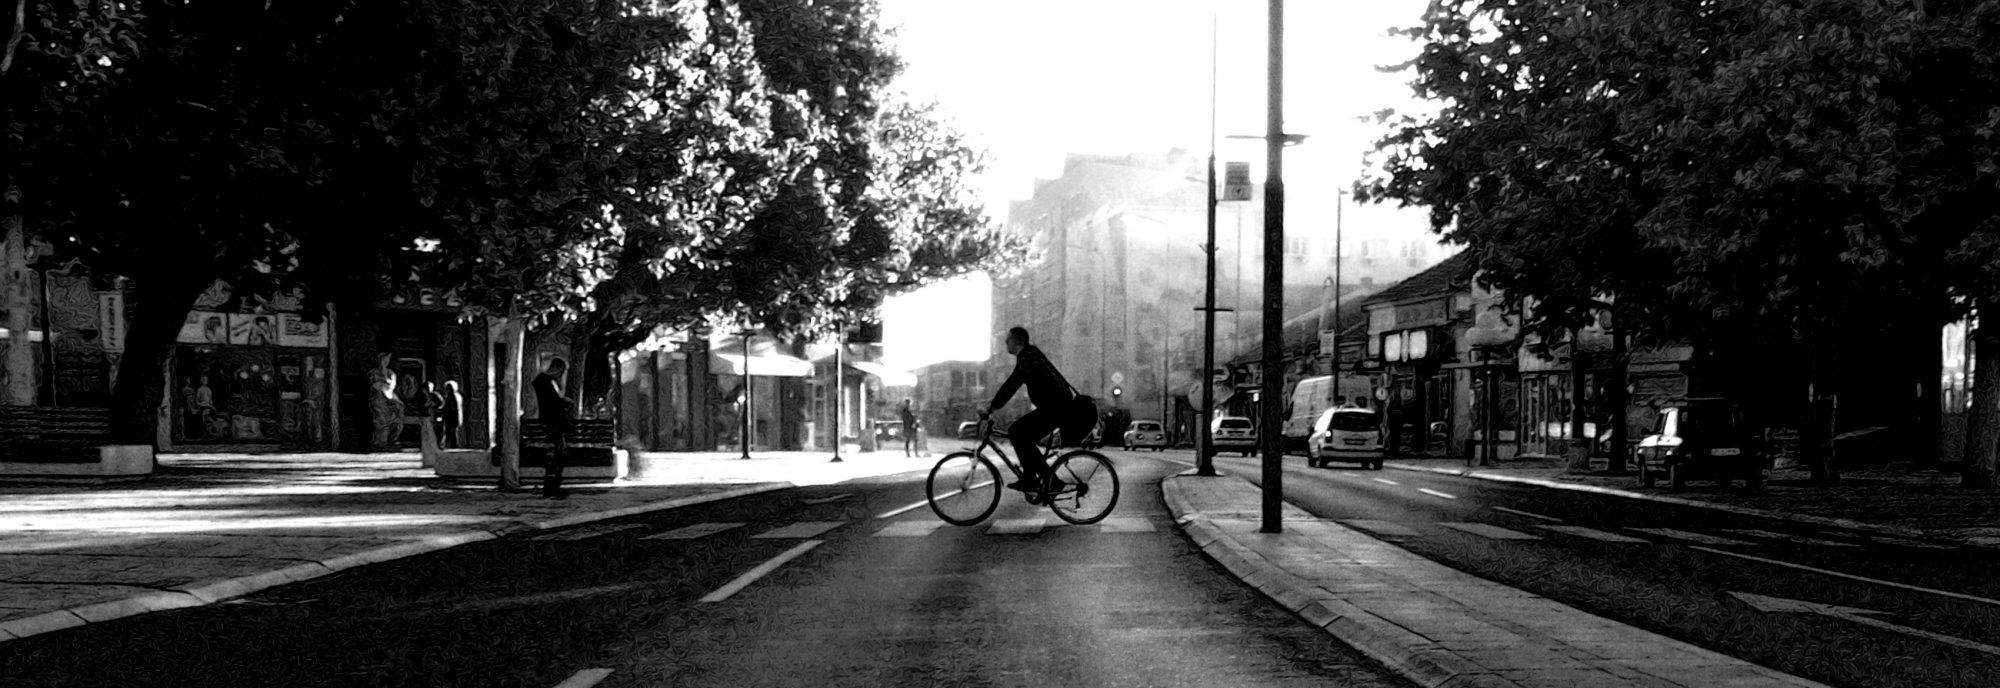 Shadows of Morning XXXVII